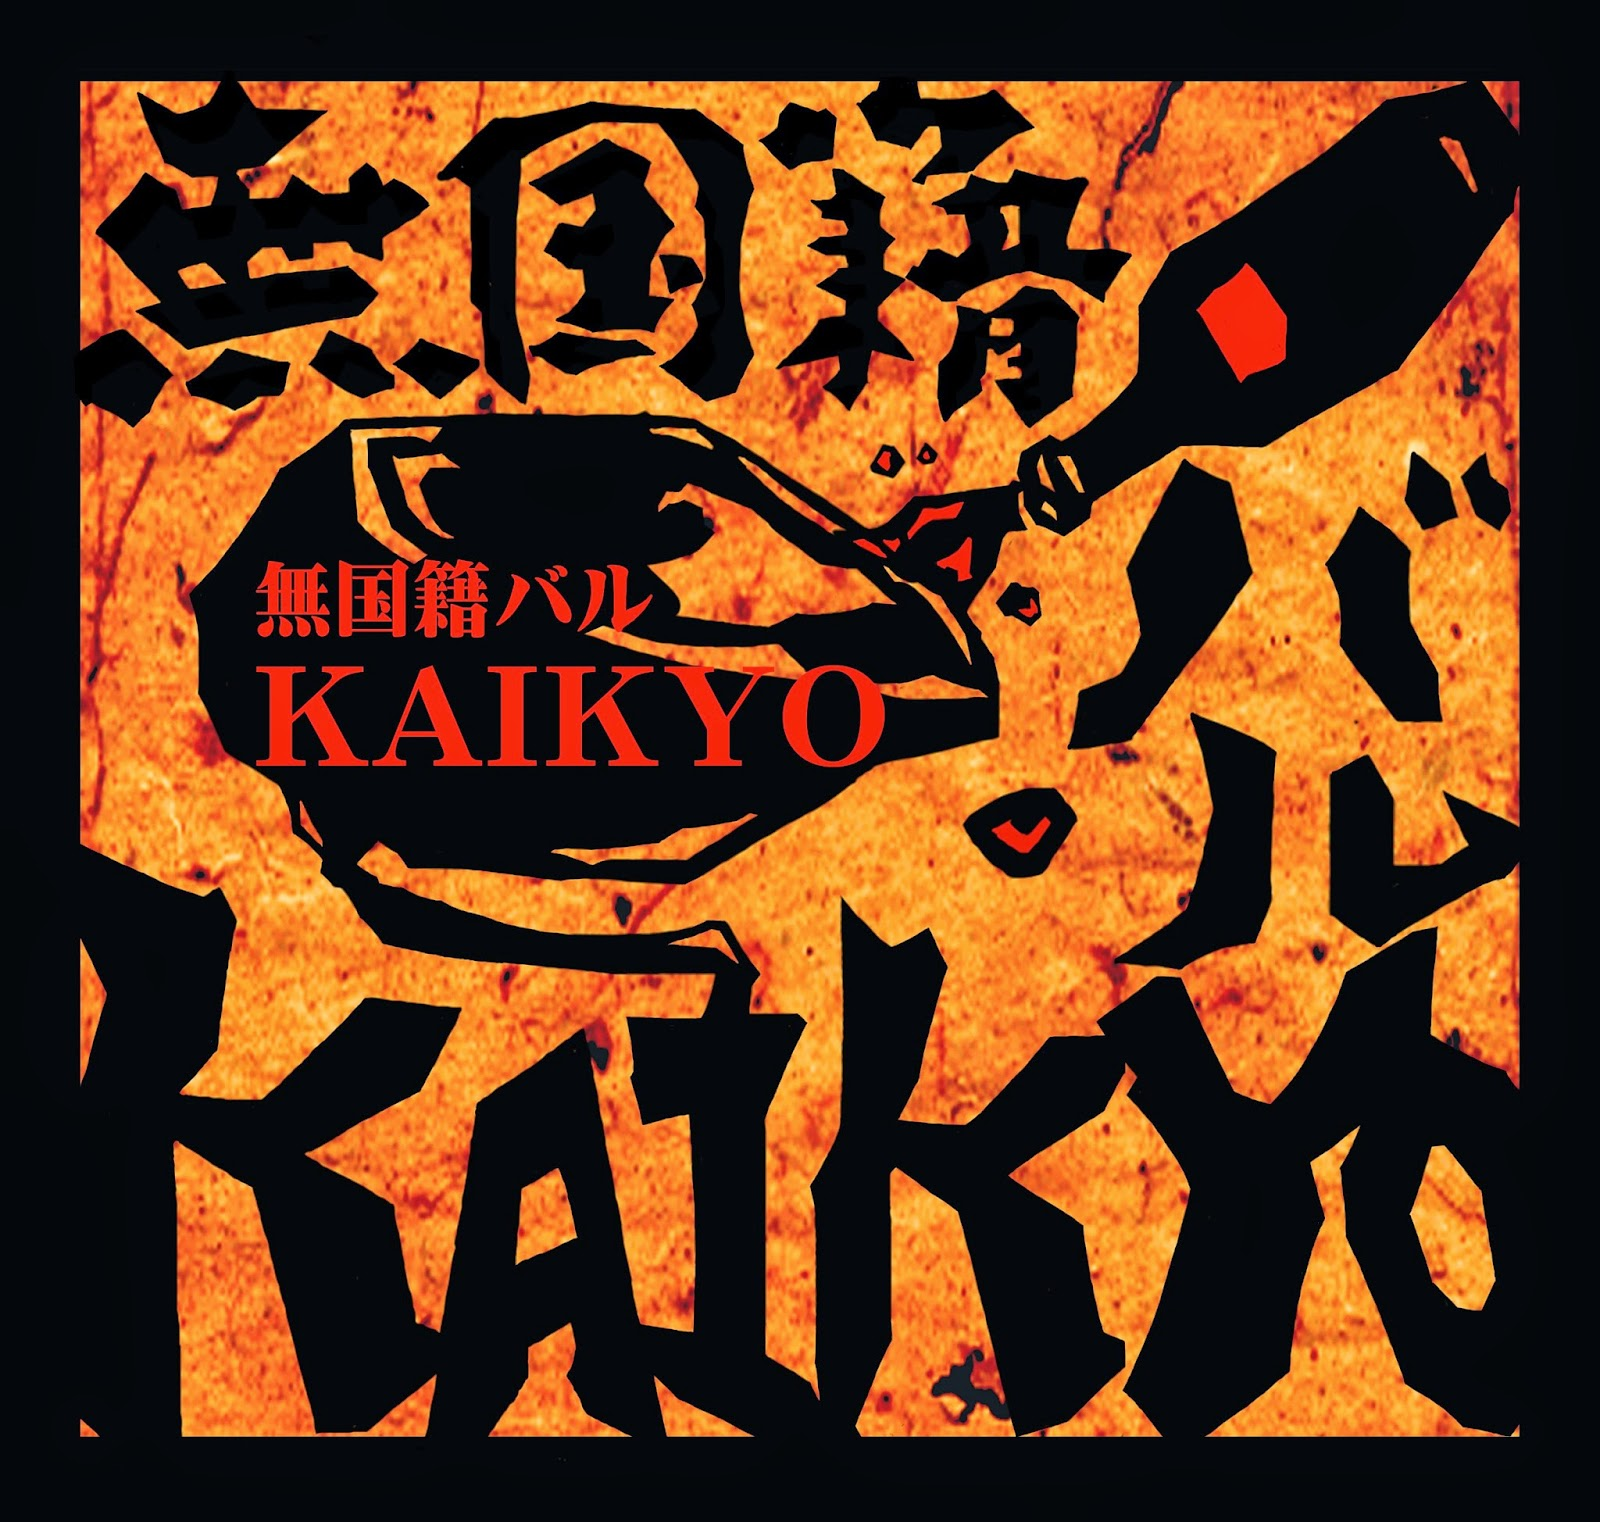 http://www.kaikyo.co.jp/cn24/pg141.html